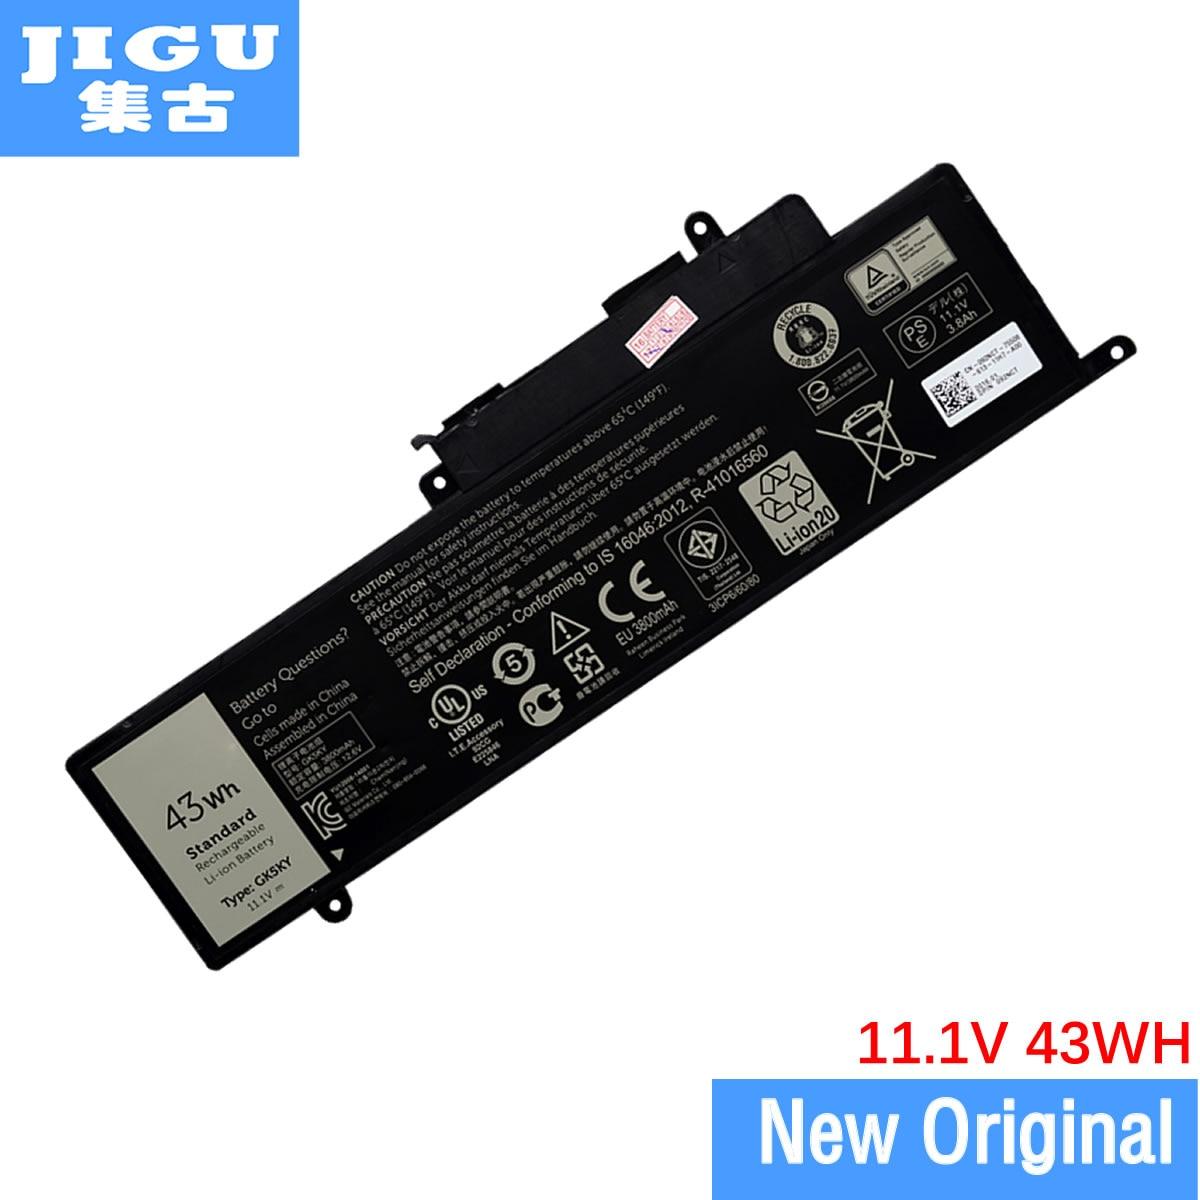 JIGU الأصلي بطارية كمبيوتر محمول لديل انسبايرون 13 7347 11 3147 15 7558 7348 GK5KY 04K8YH 31NP6/60/80 11.1V 43WH